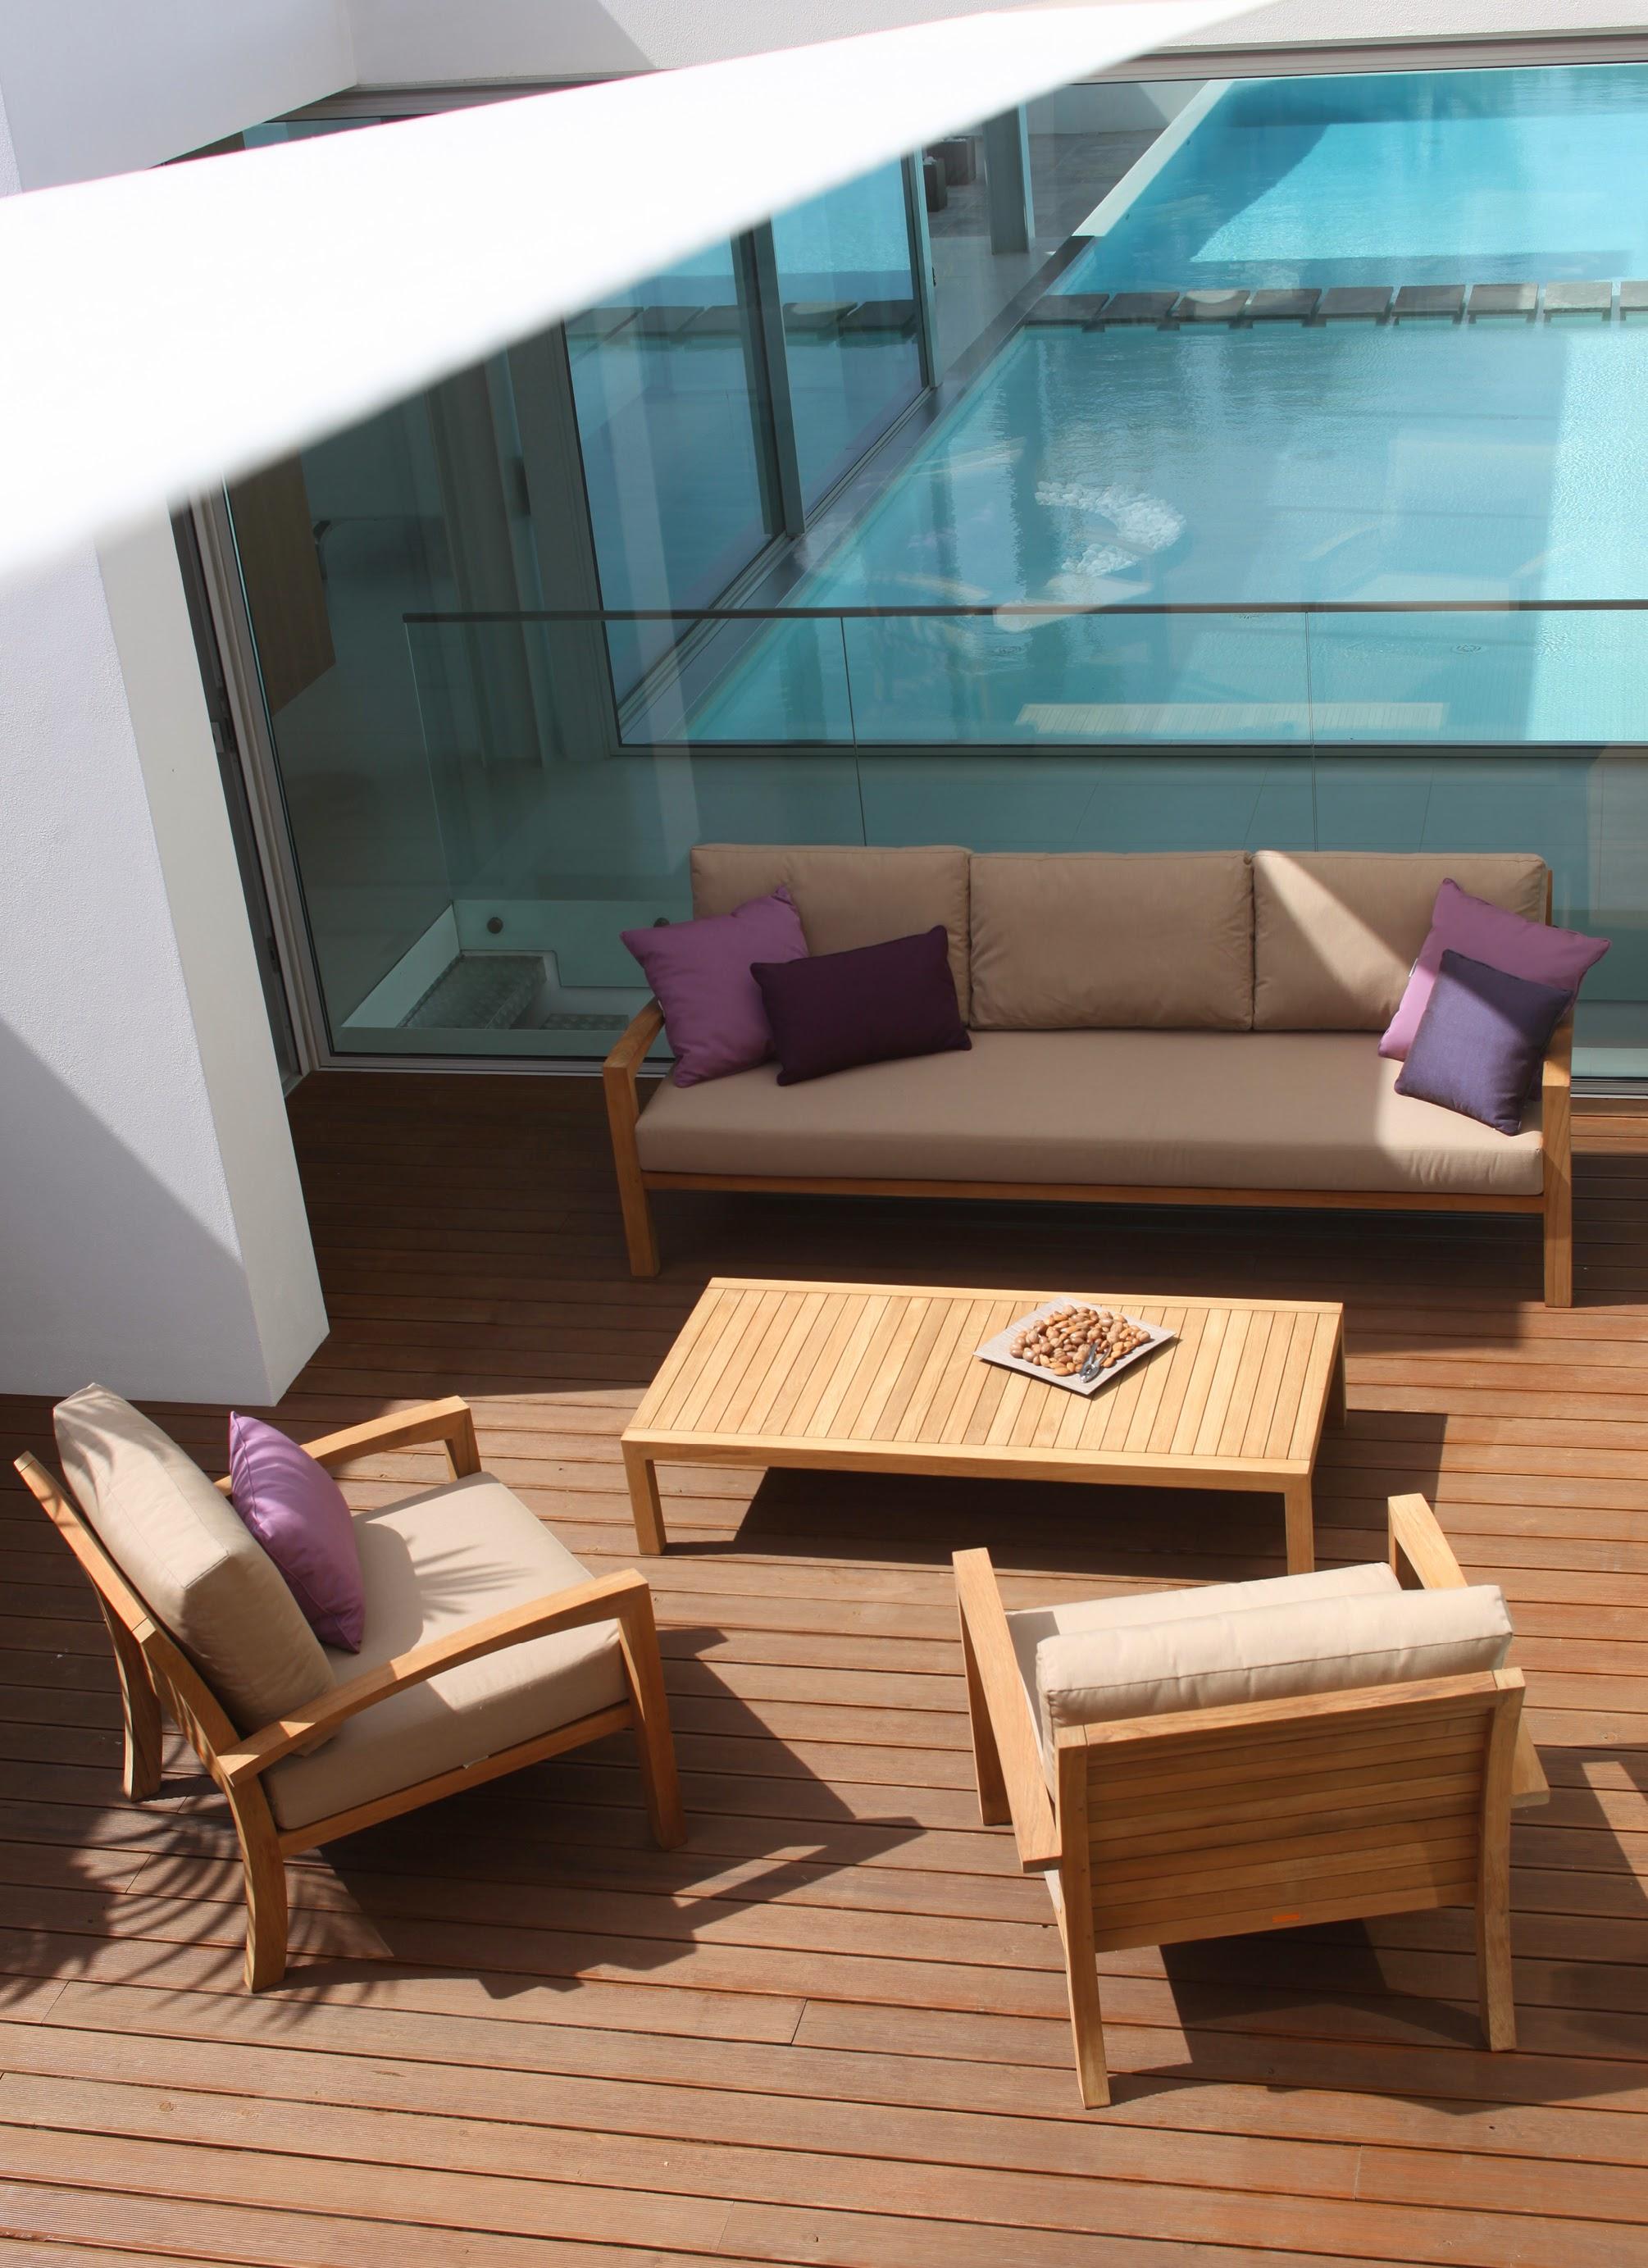 royal botania ixit ernst baas tuininrichting. Black Bedroom Furniture Sets. Home Design Ideas